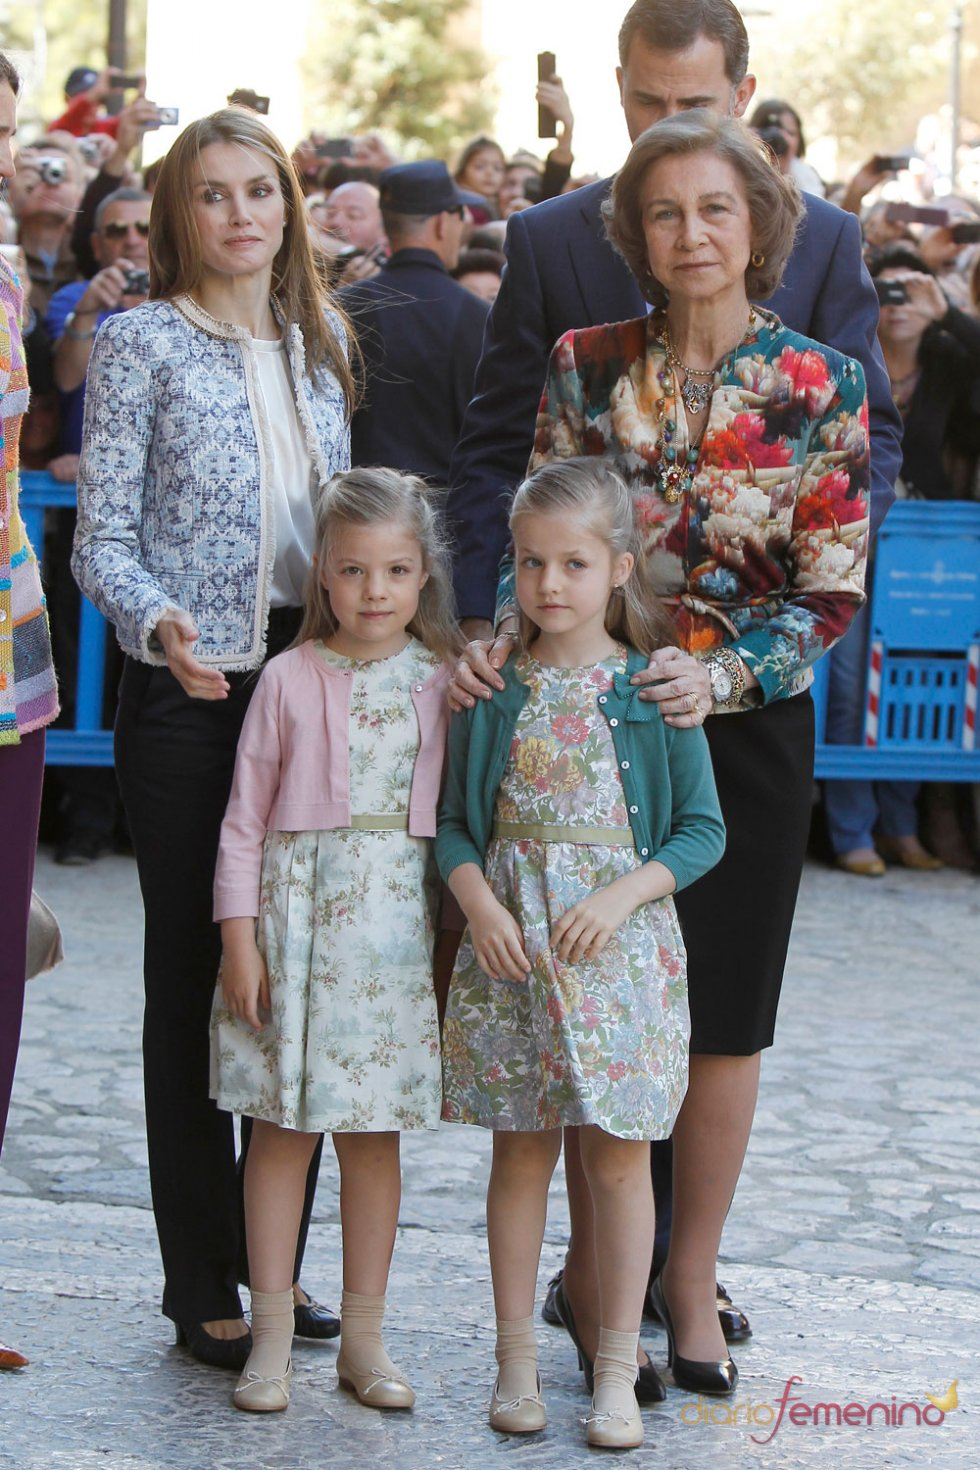 La Reina Sofía, la perfecta abuela en la Pascua de la Semana Santa 2013